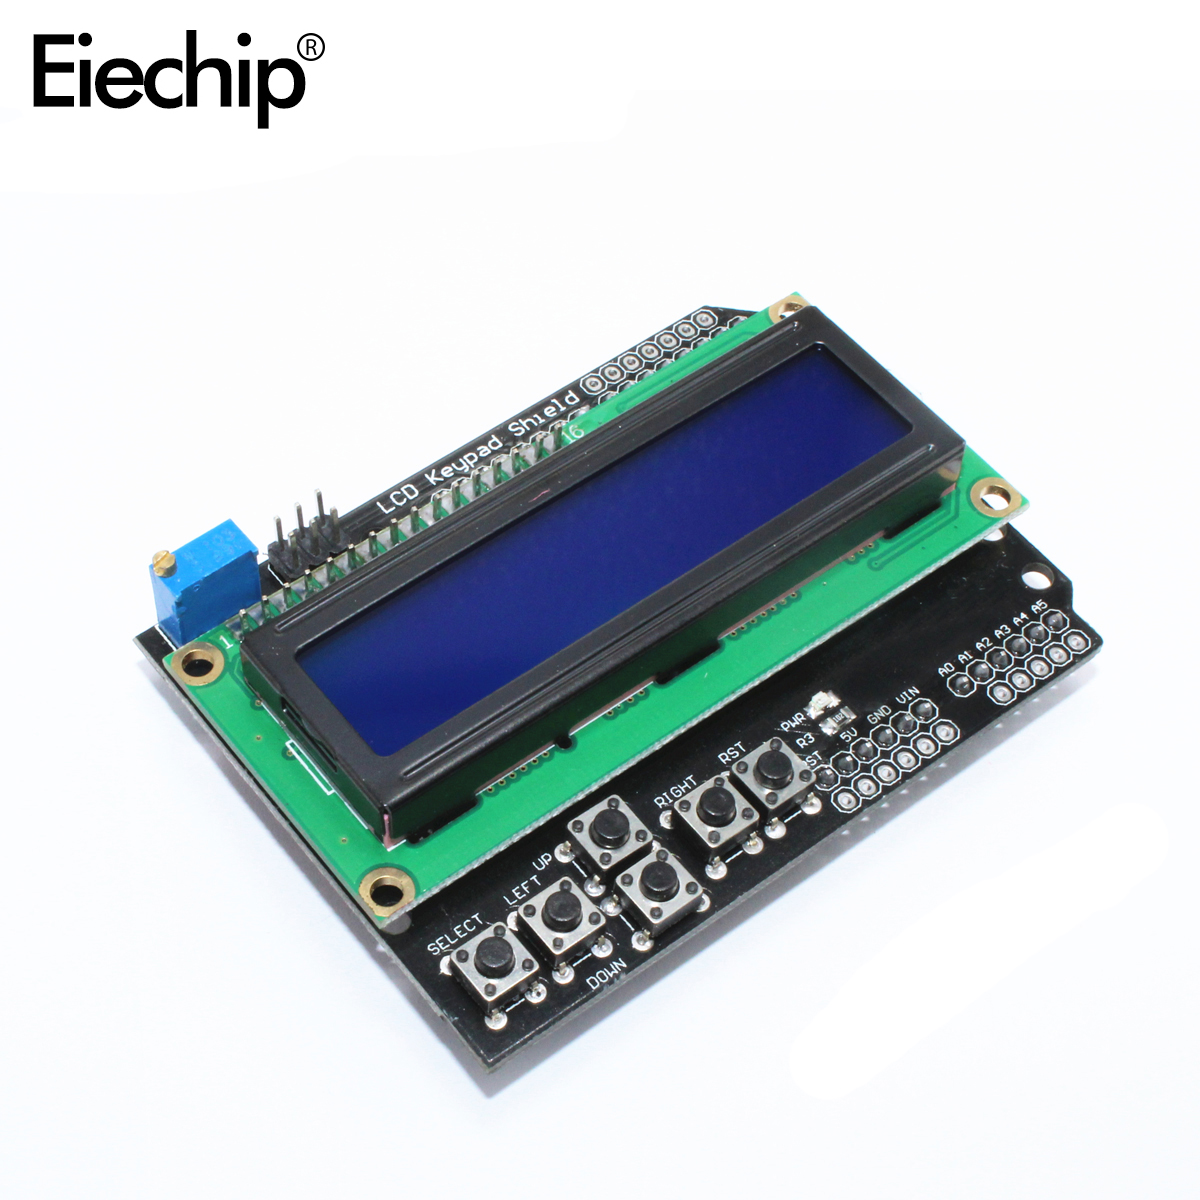 LCD Tastatur Schild LCD1602 LCD Modul Display Für arduino ATMEGA328 ATMEGA2560 Für Raspberry pi 1602 Blau Screen Display Board